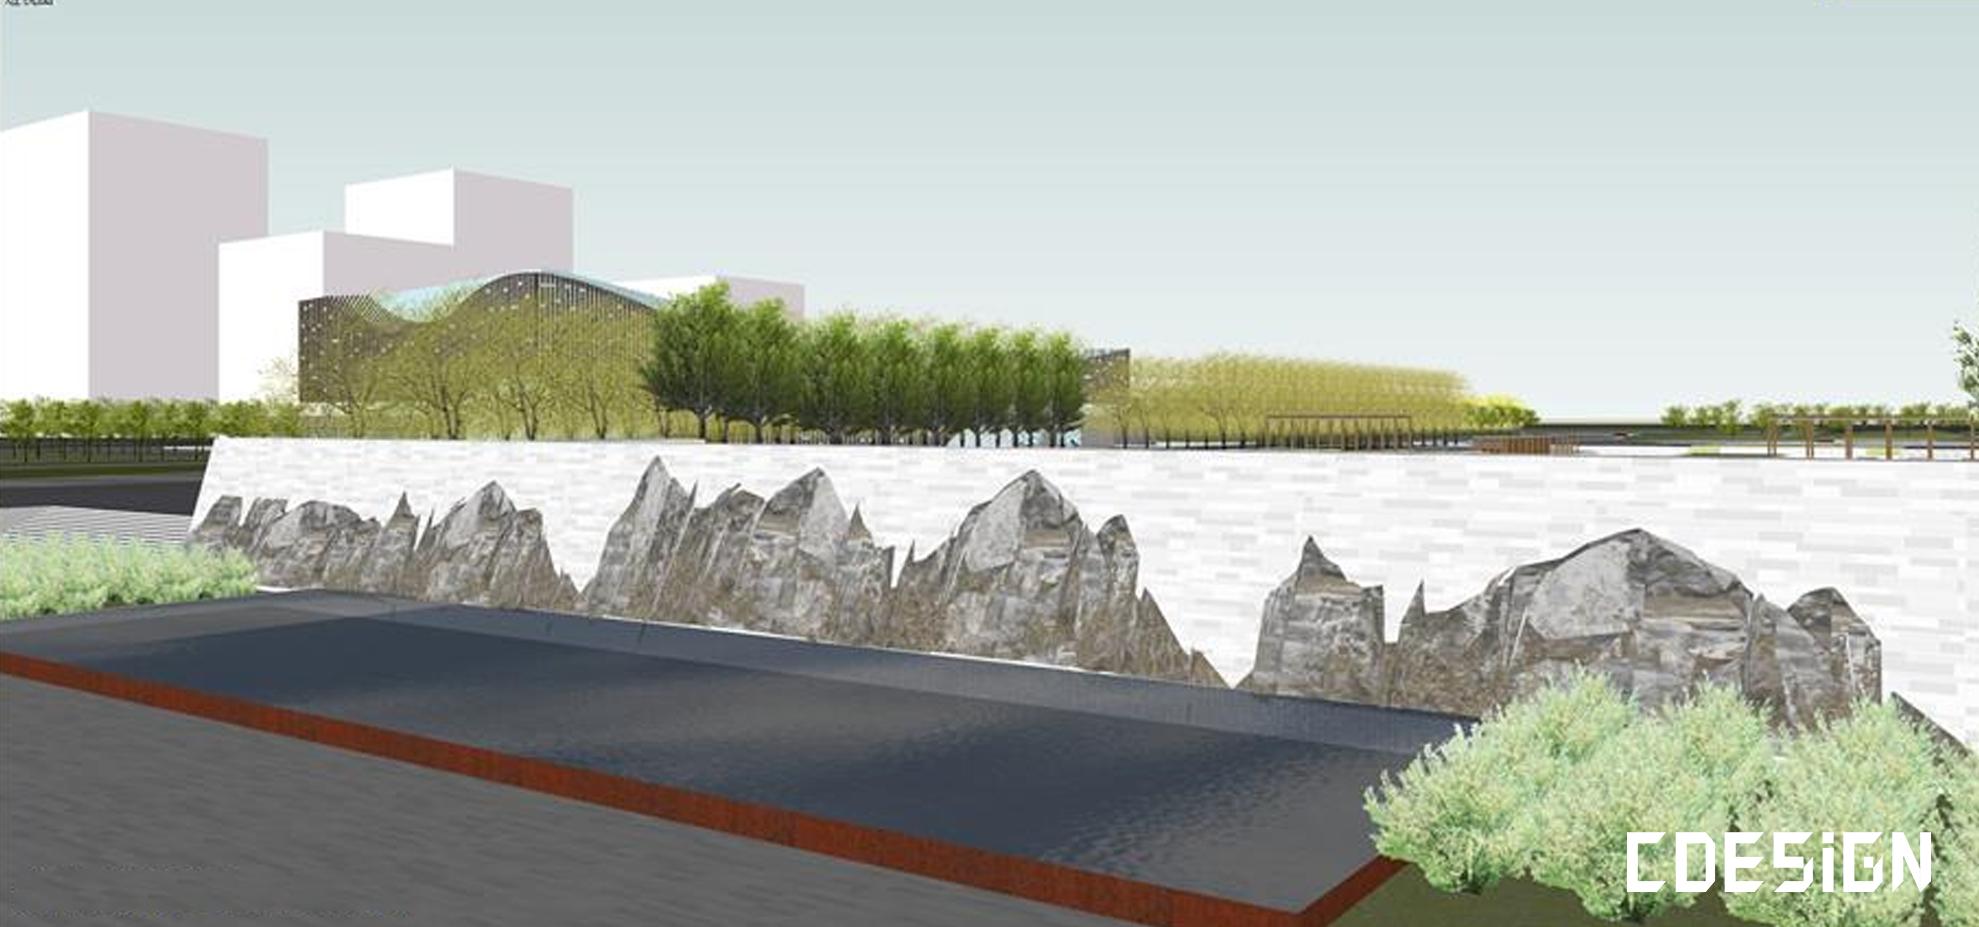 [SU]文化中心建筑设计方案su模型   建筑设计方案插图8-泛设计